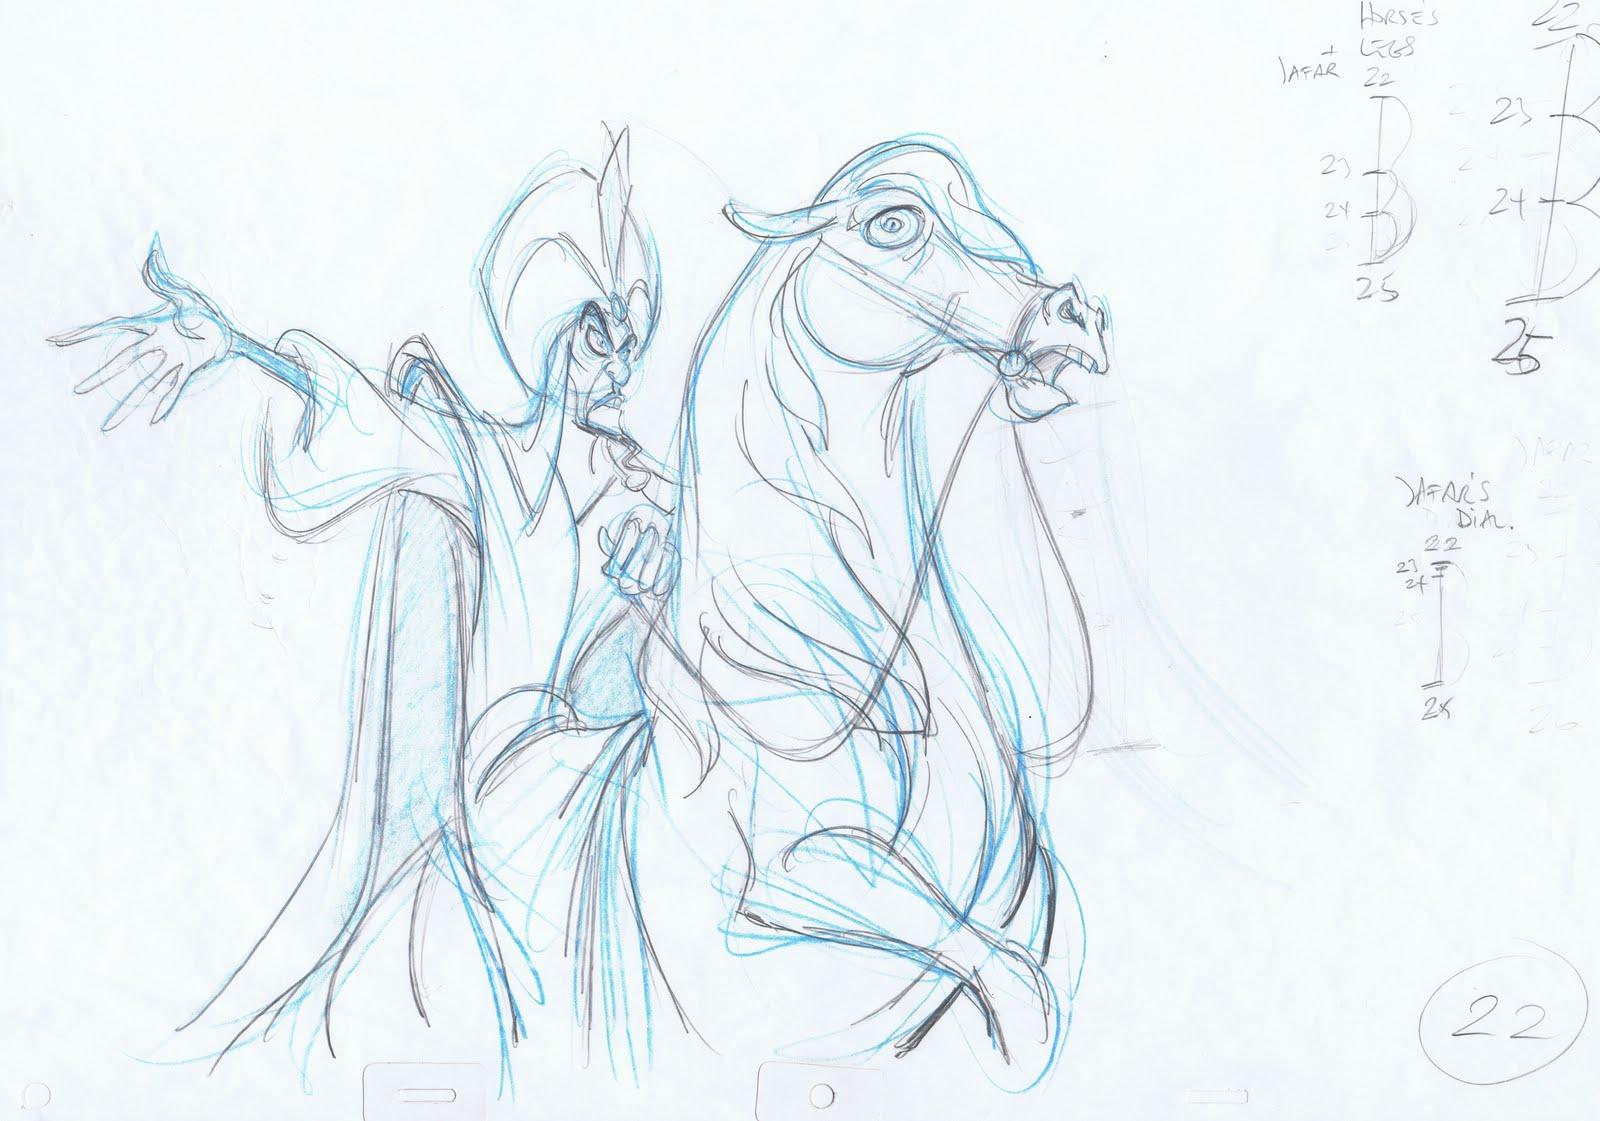 aladdin_production_drawing_andreas_deja_6.jpg